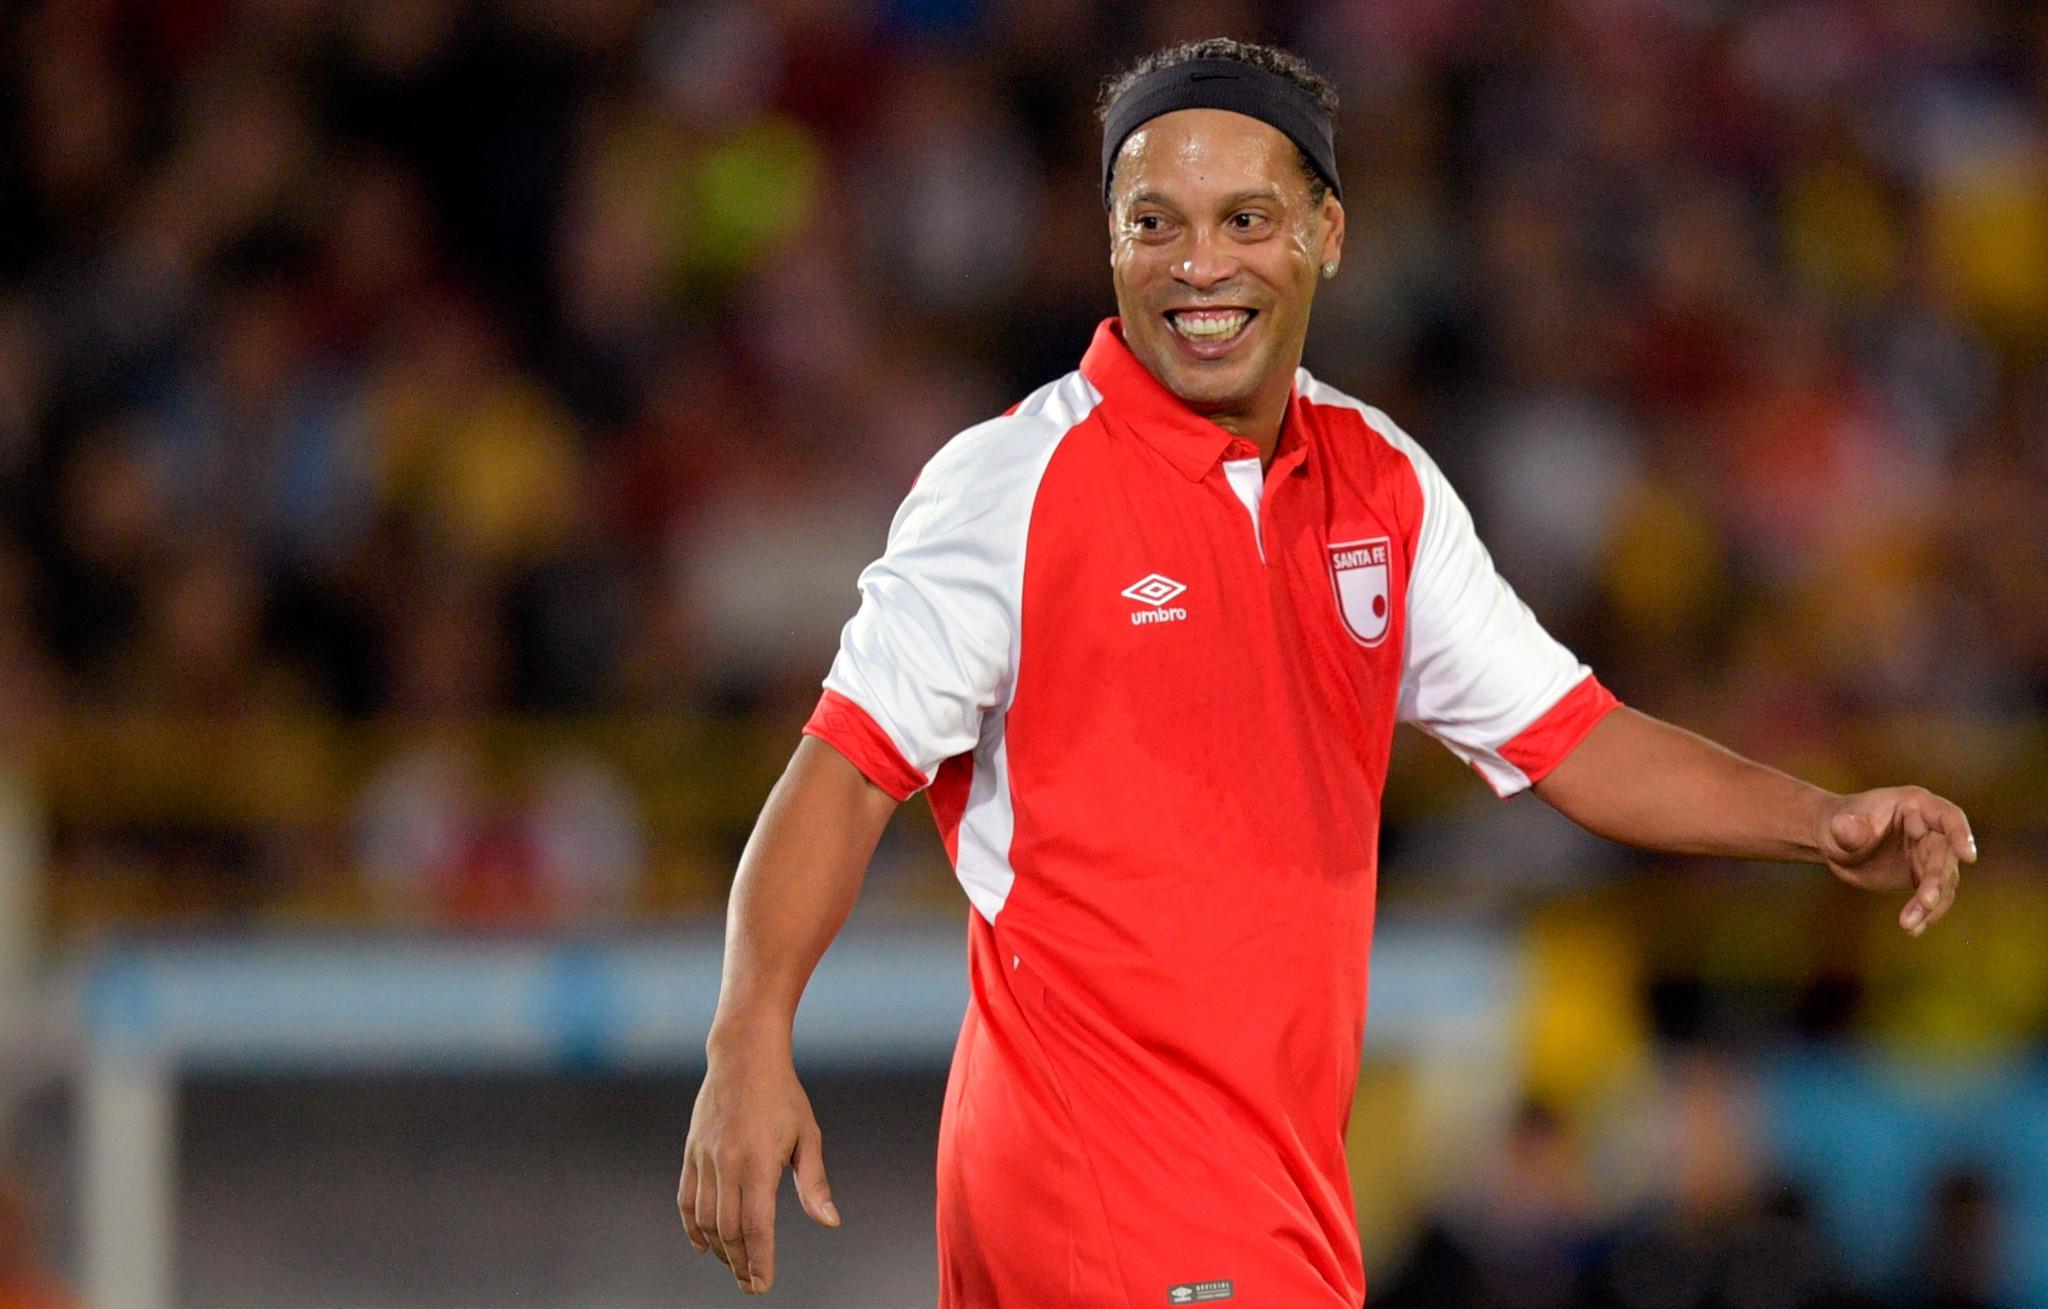 Teqball drills from Ronaldinho added to FITEQ education platform